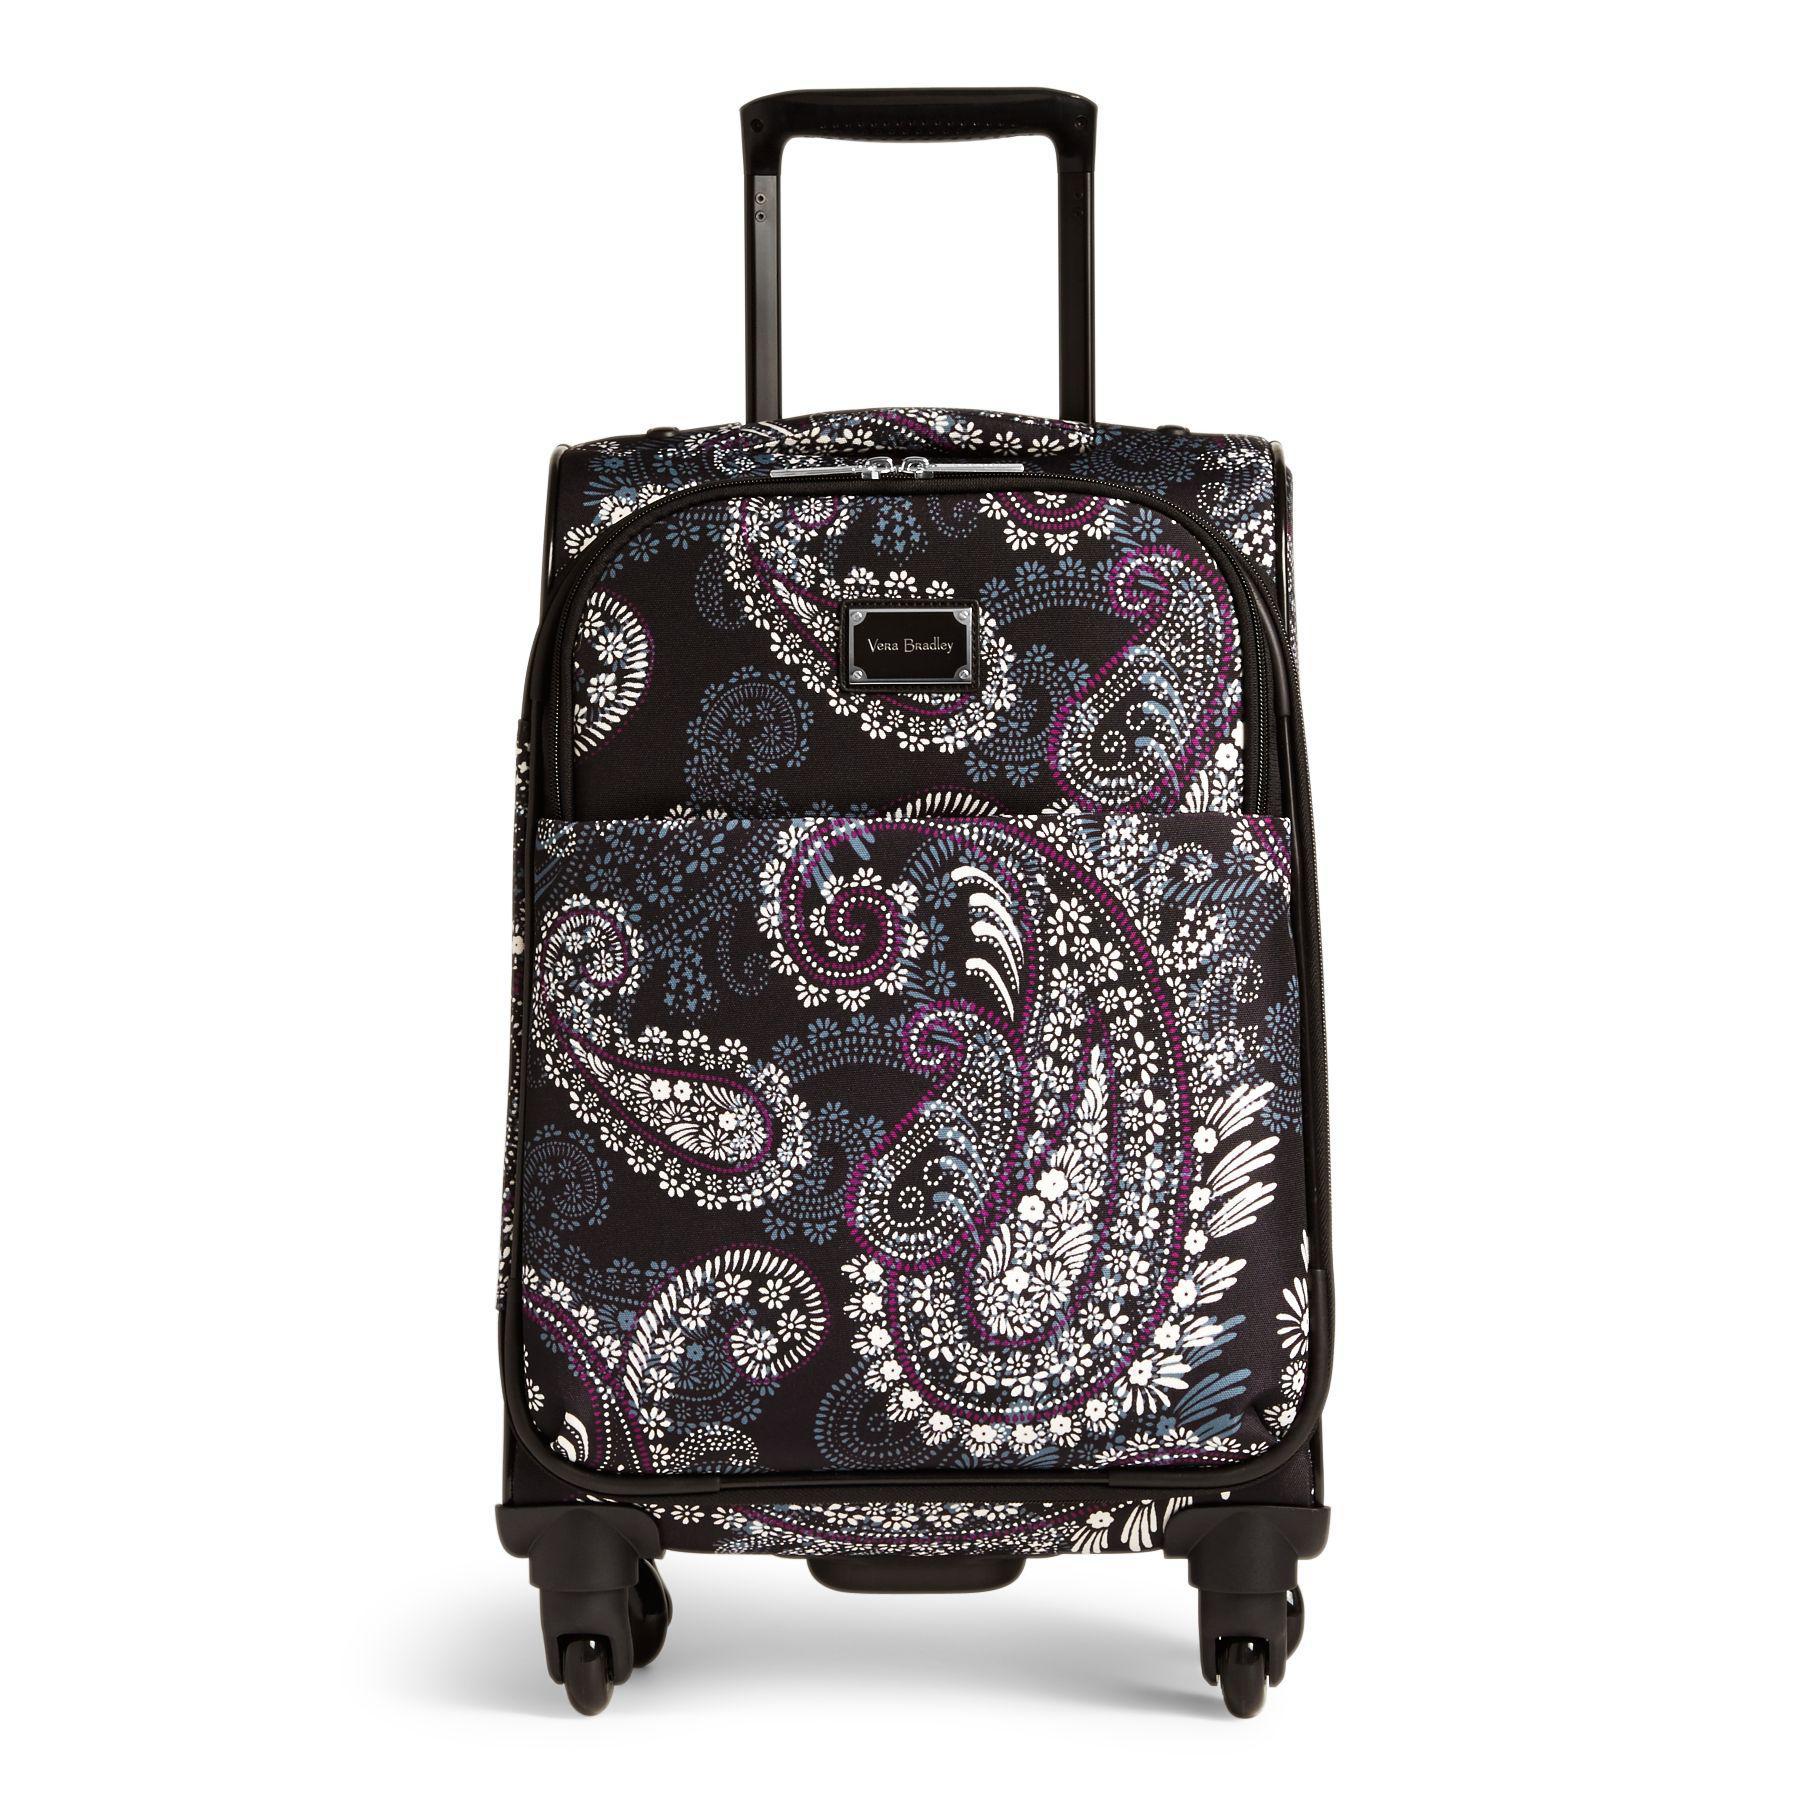 b1590d9be1 Lyst - Vera Bradley Spinner Luggage Set in Black